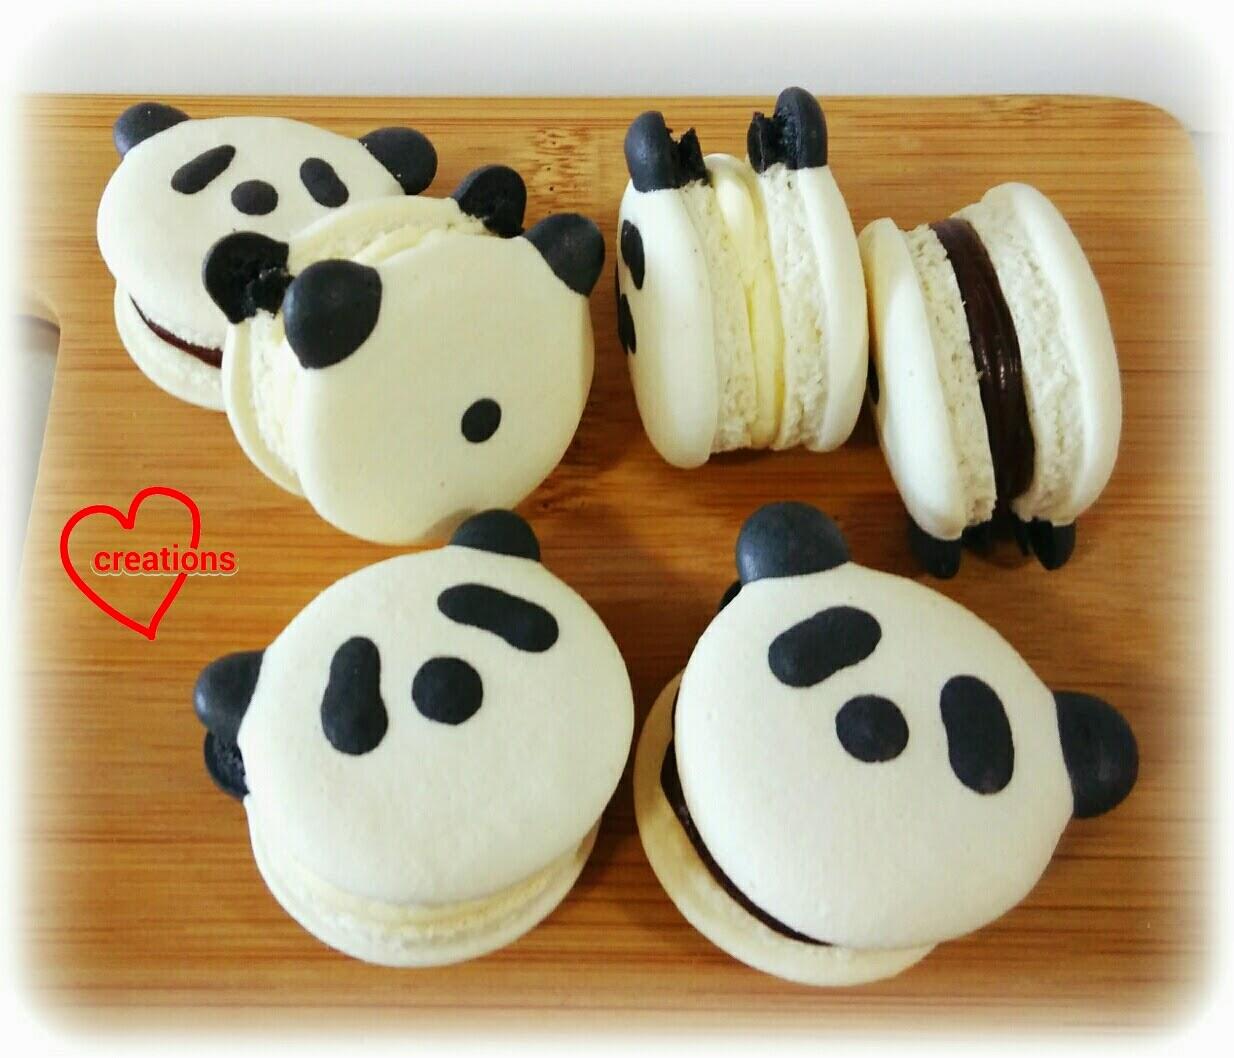 Loving Creations For You Panda Macarons With Lemon And